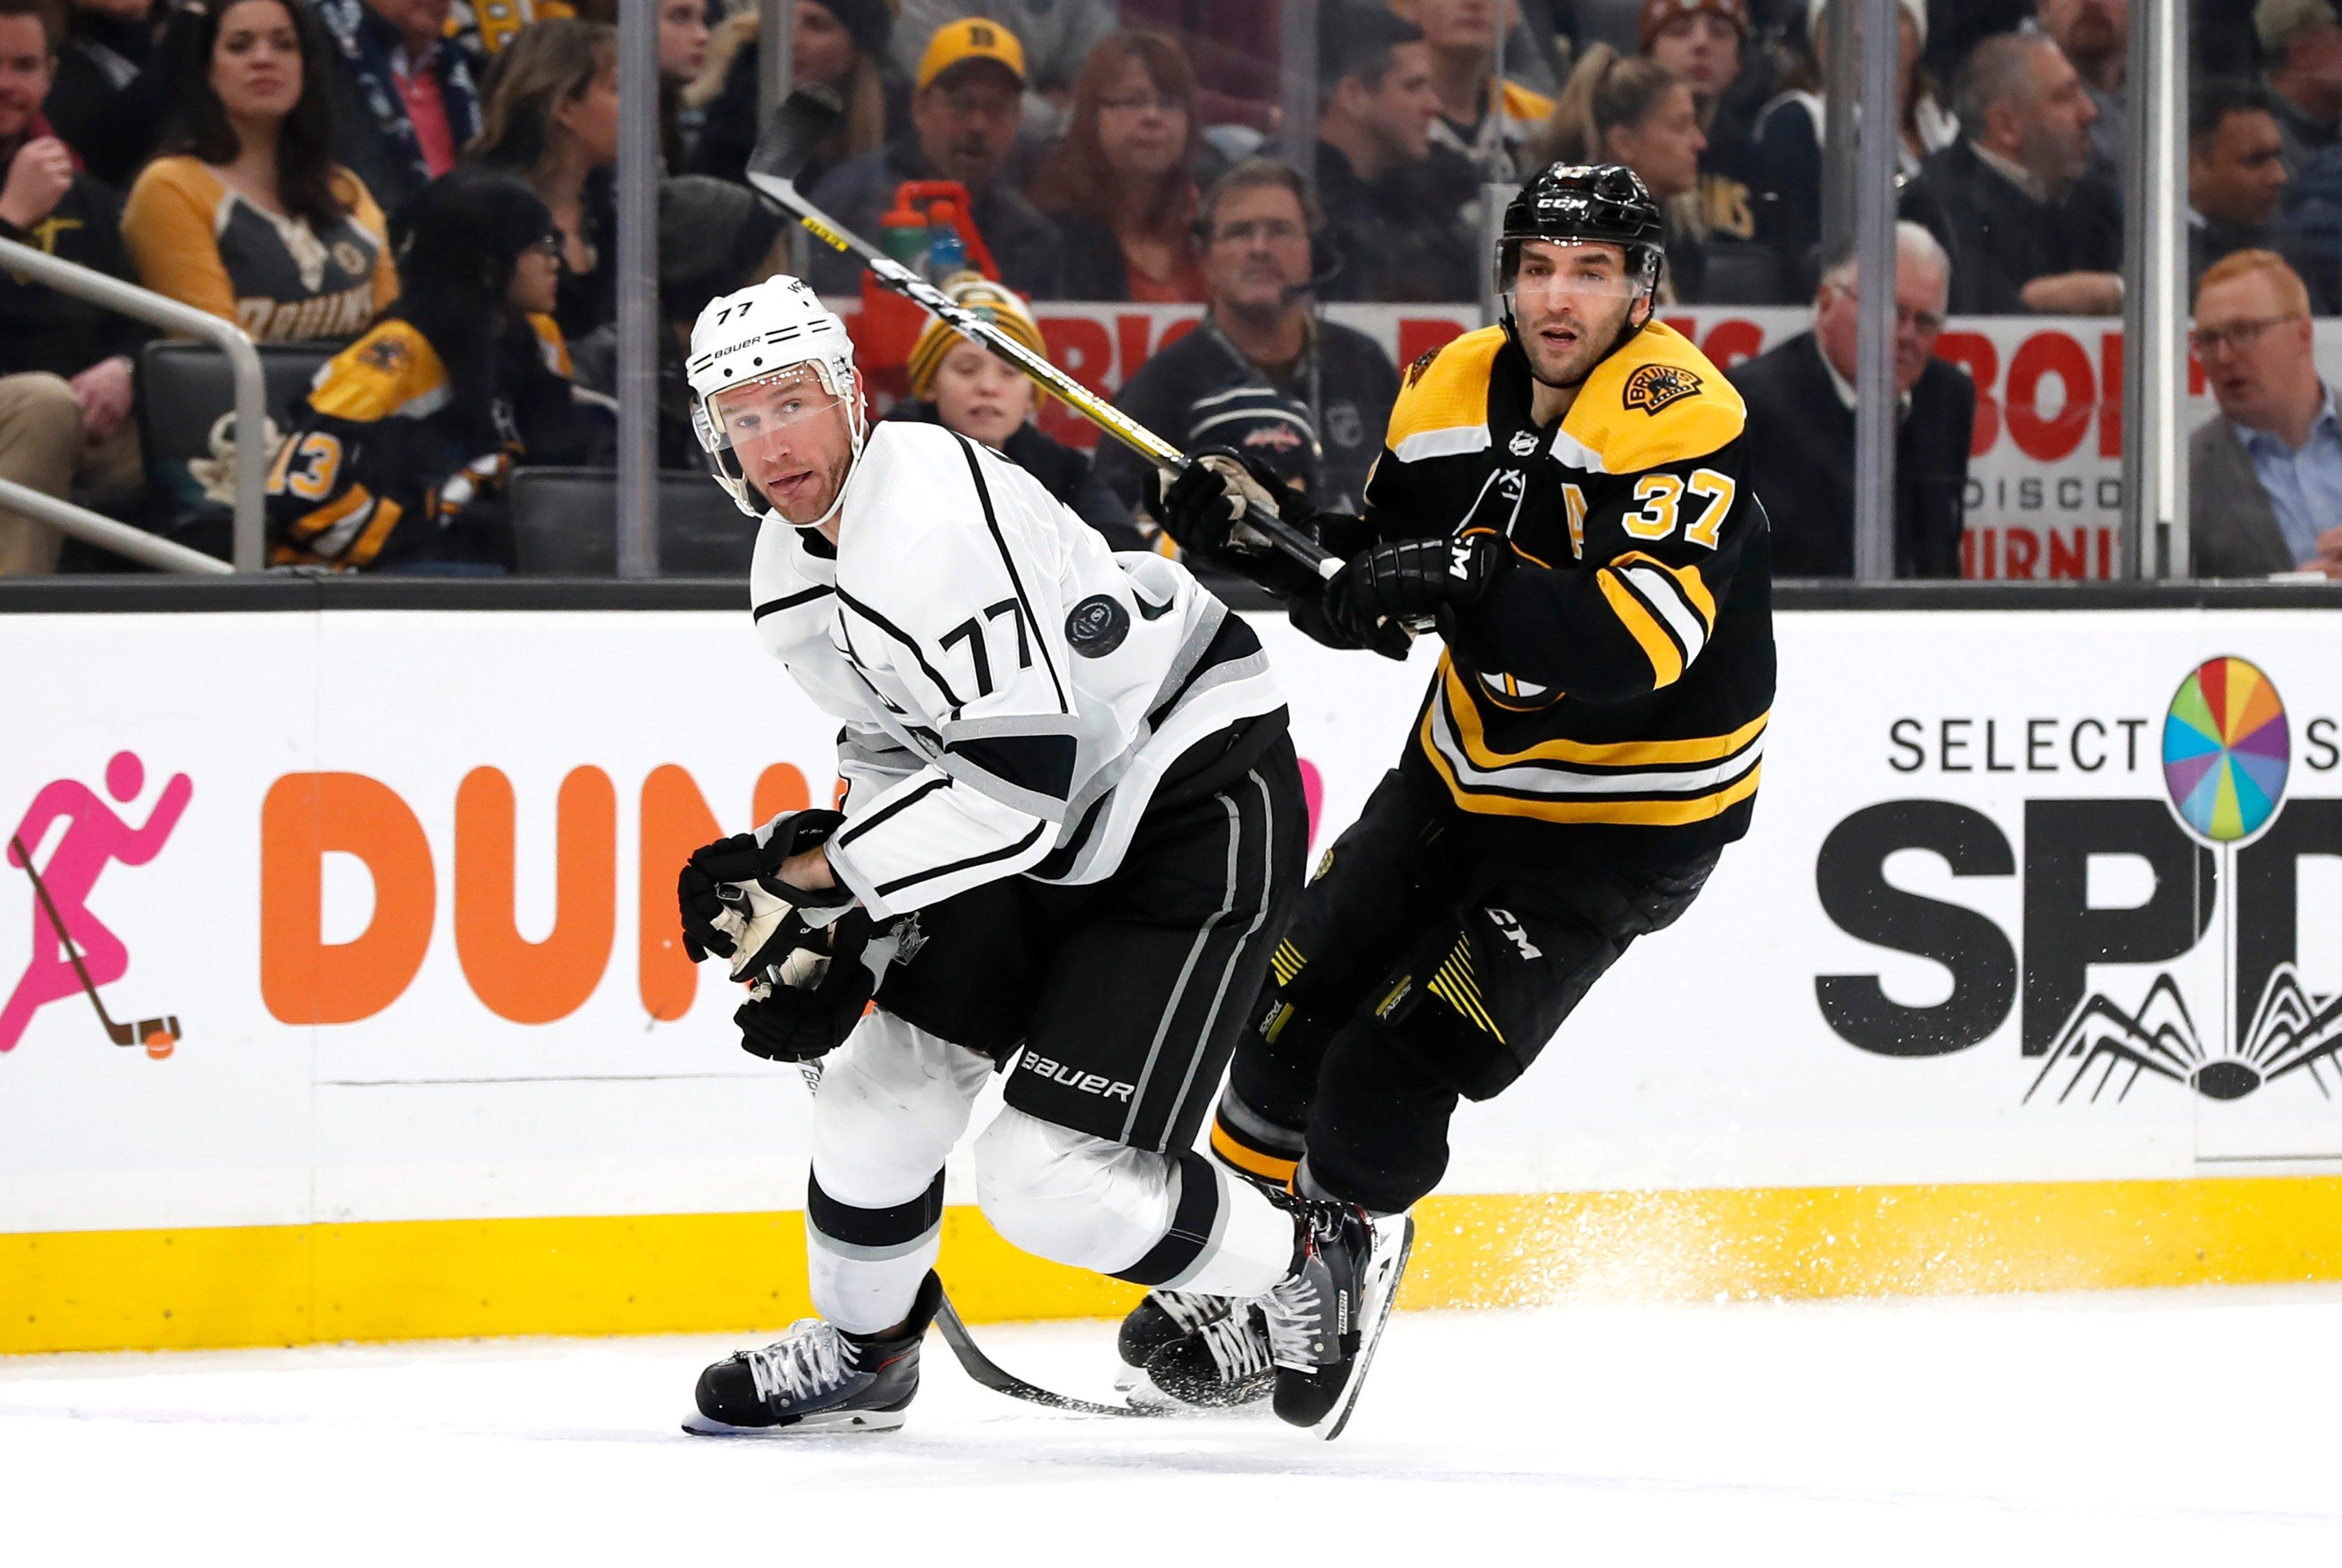 Kopitar scores in OT, Kings beat Bruins 4-3